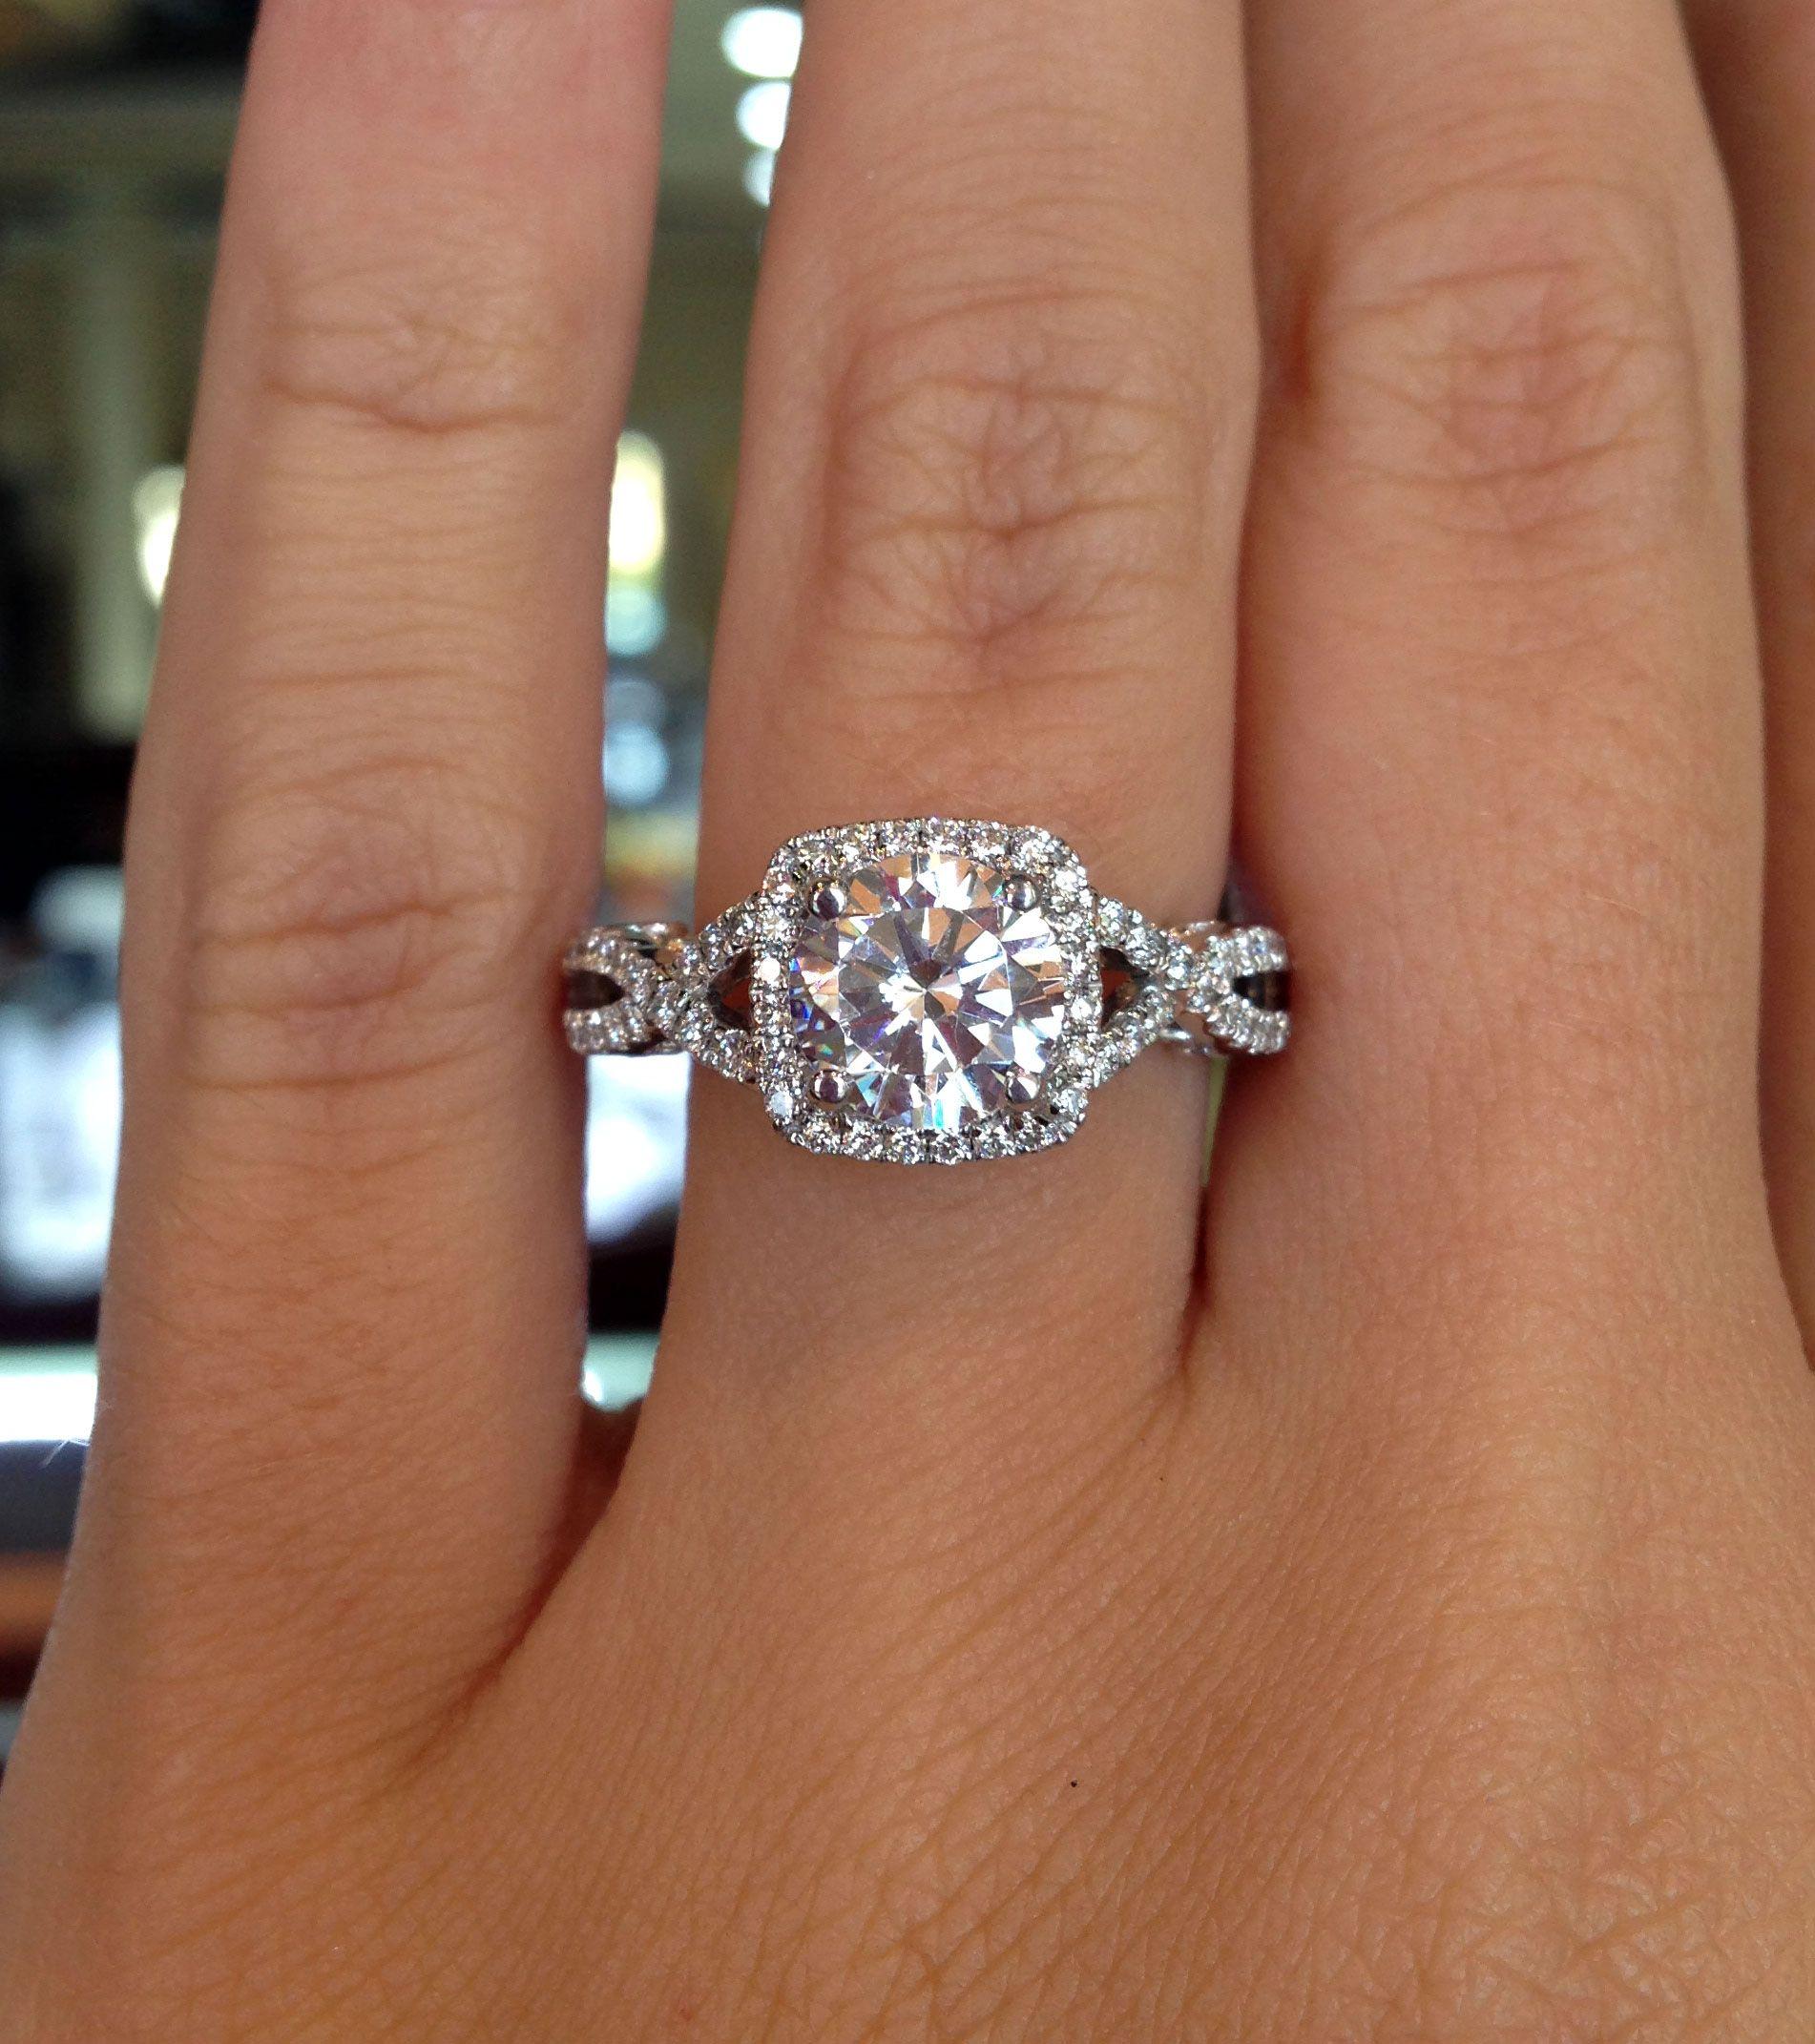 Verragio Ins7070cugold Diamond Engagement Ring Dream Ring! Cushion Cut  With A